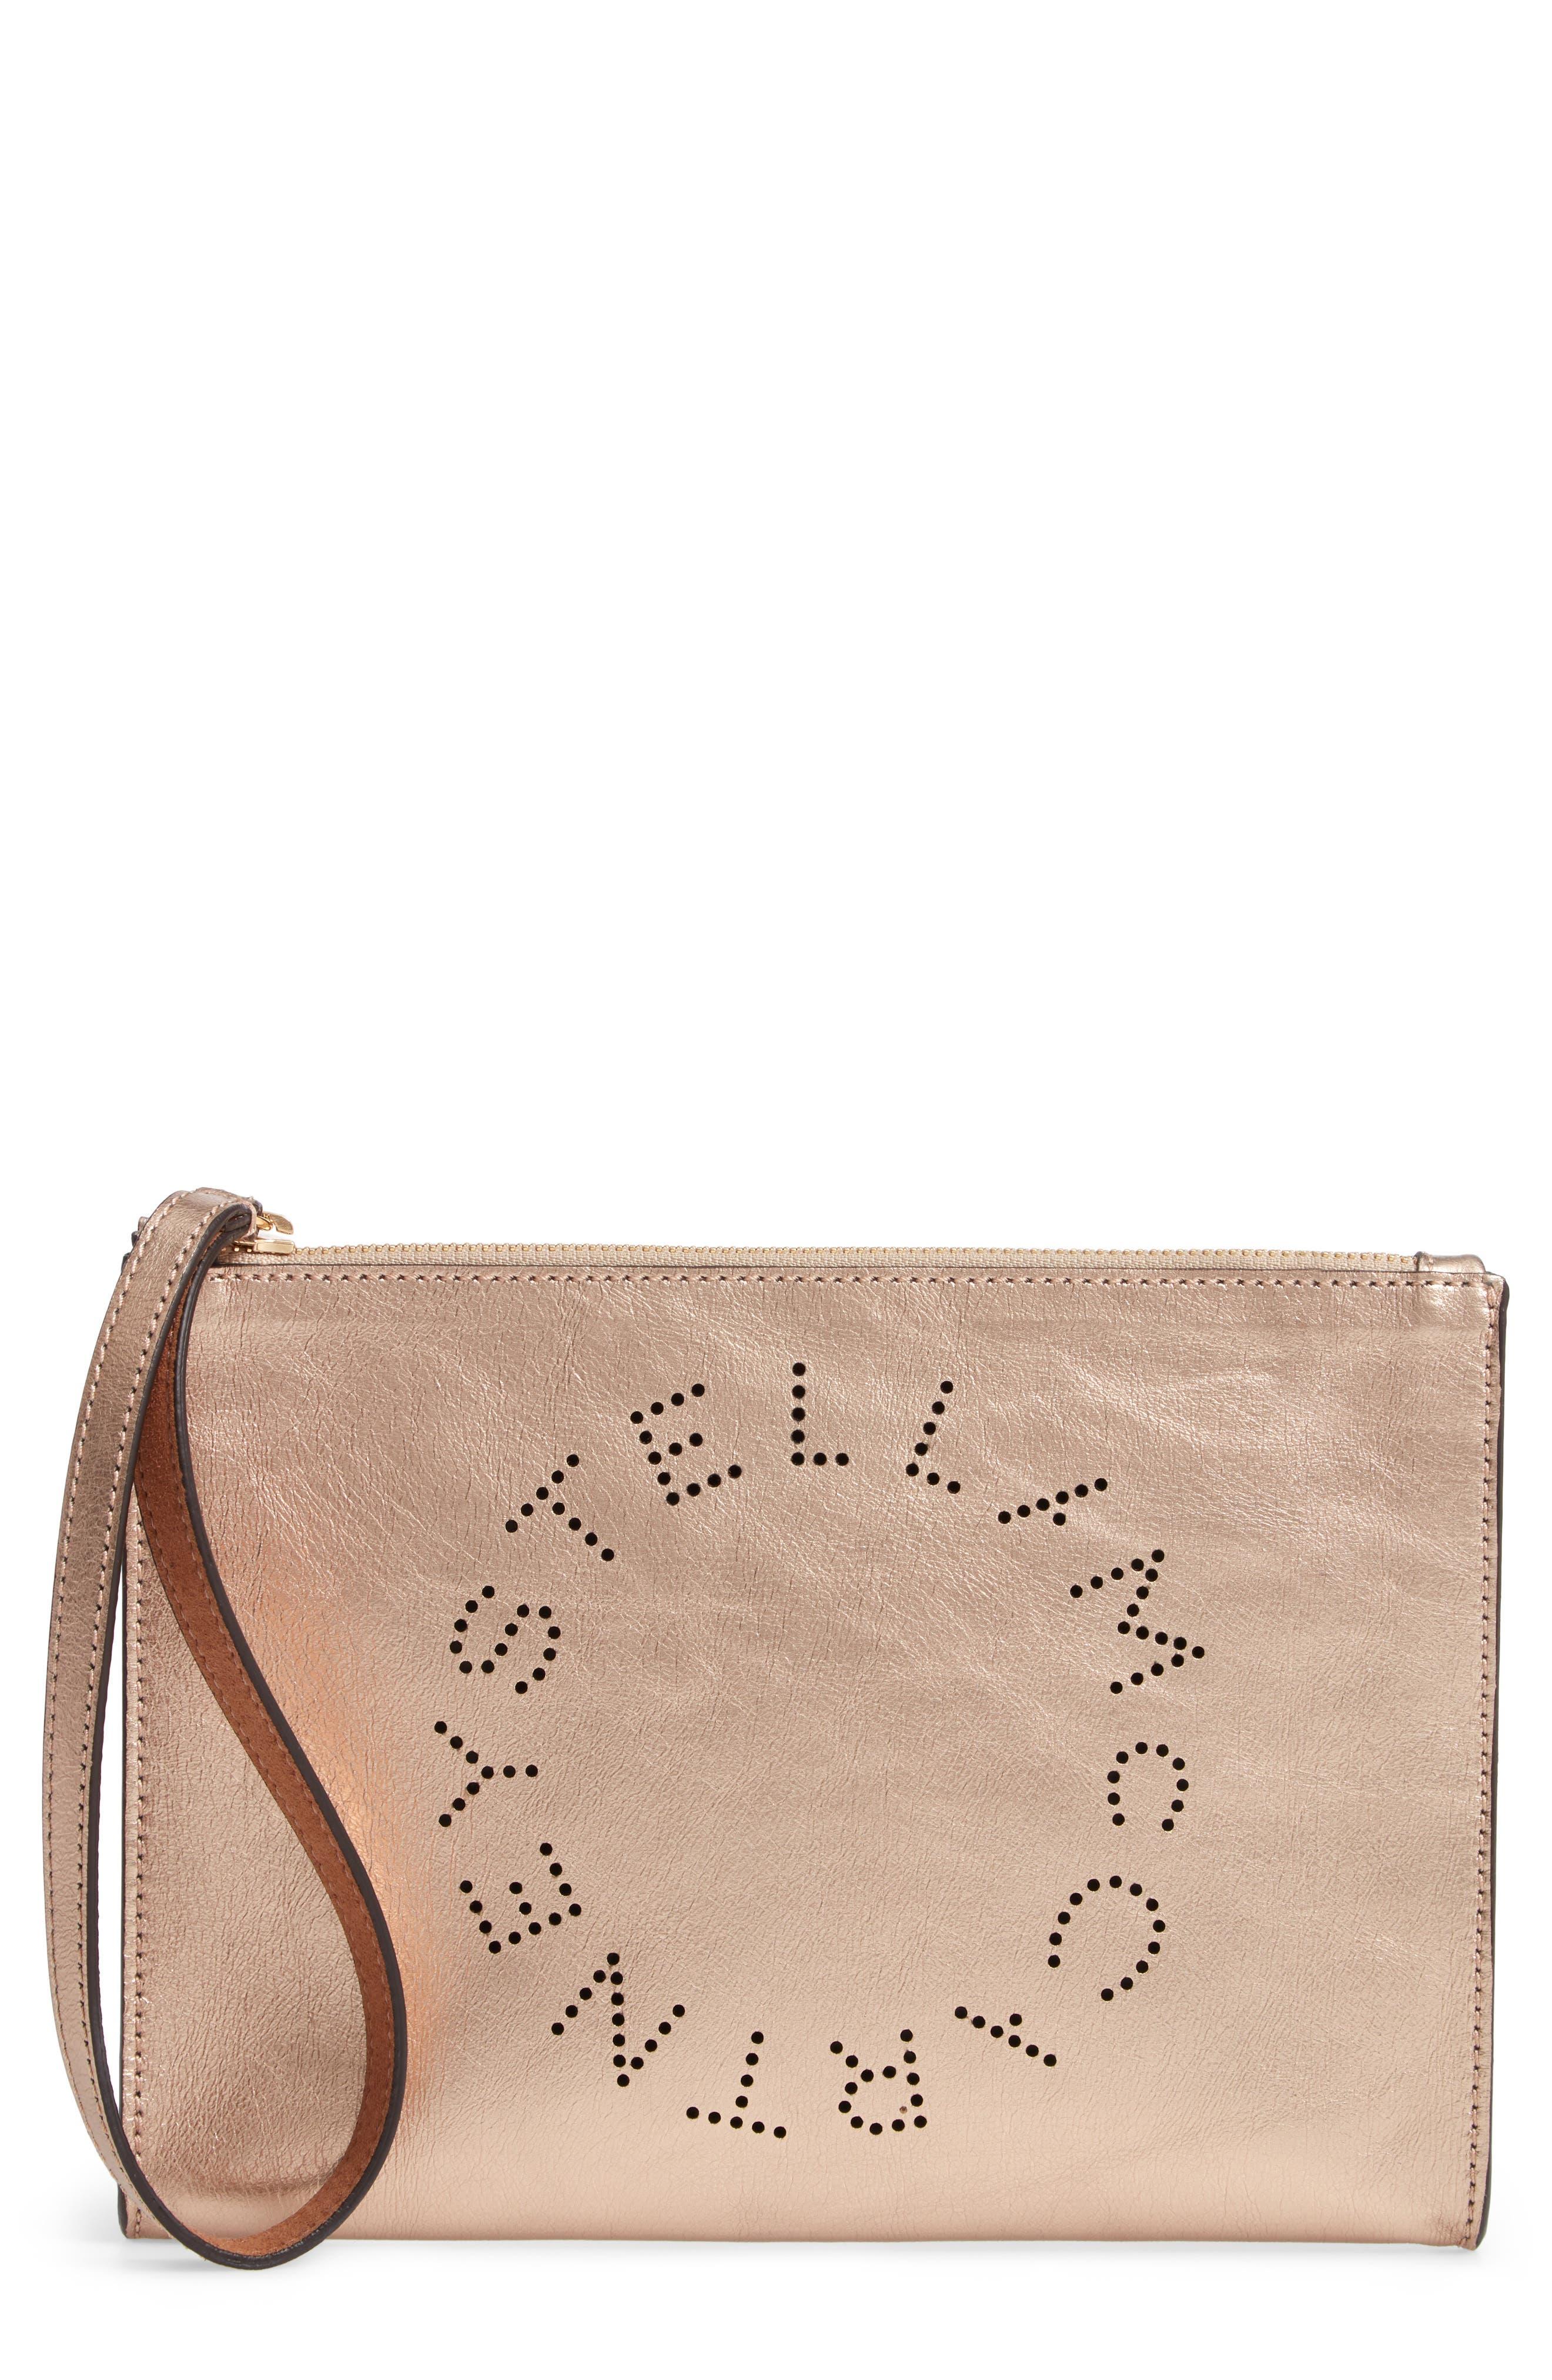 STELLA MCCARTNEY Metallic Faux Nappa Leather Wristlet Clutch, Main, color, 715